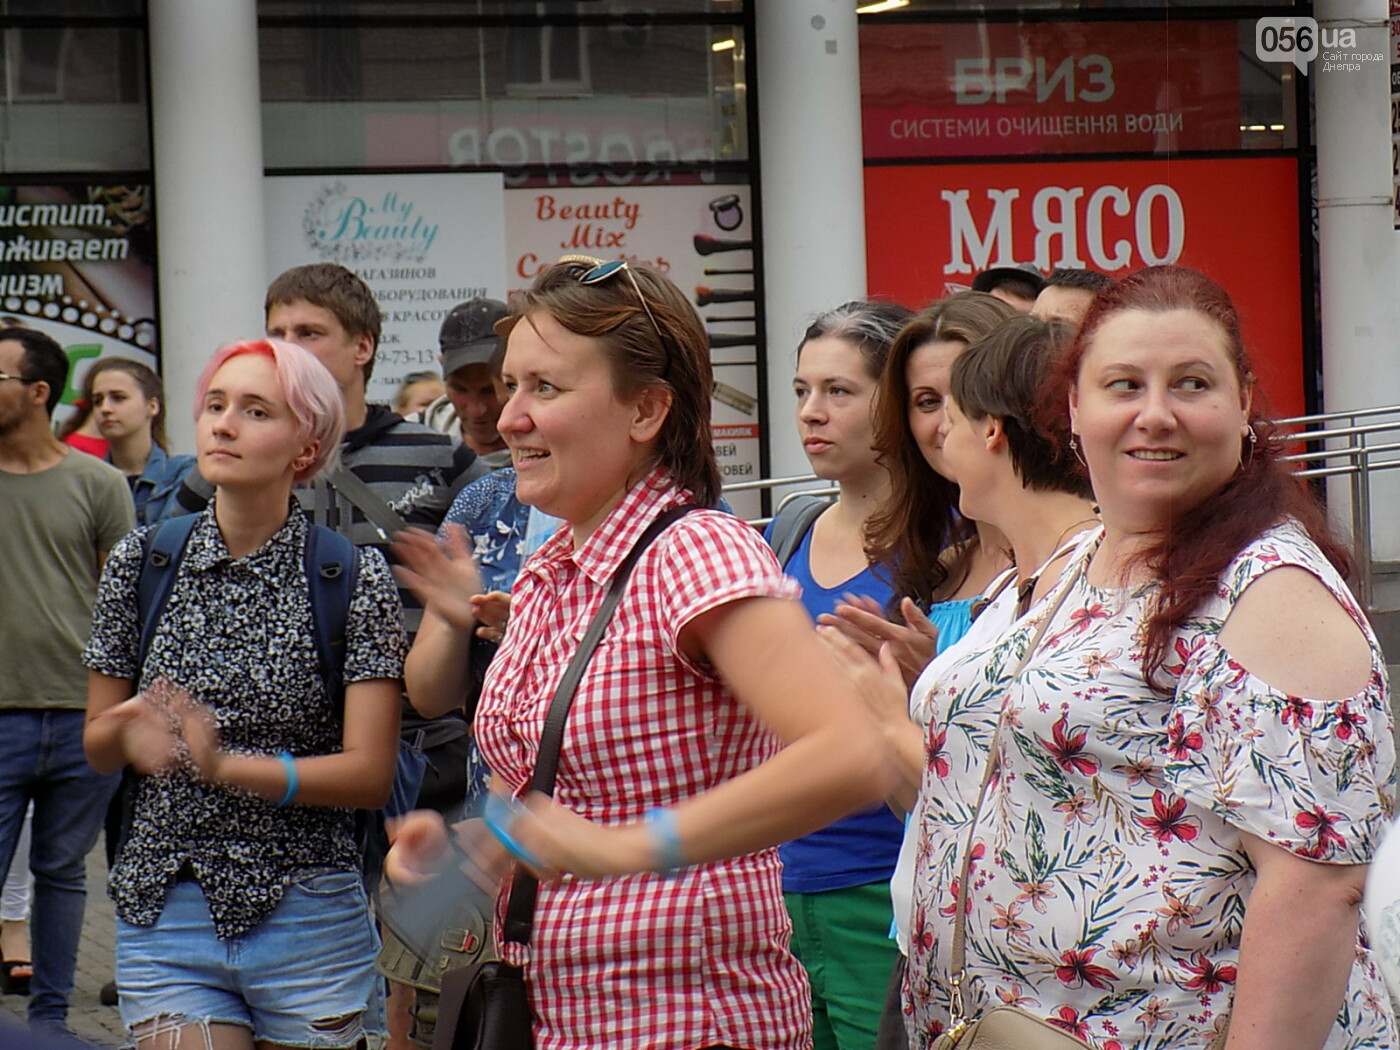 """Мова єднає Дніпро"": в центре города прошла символическая акция с концертом и подарками, - ФОТО, фото-11"